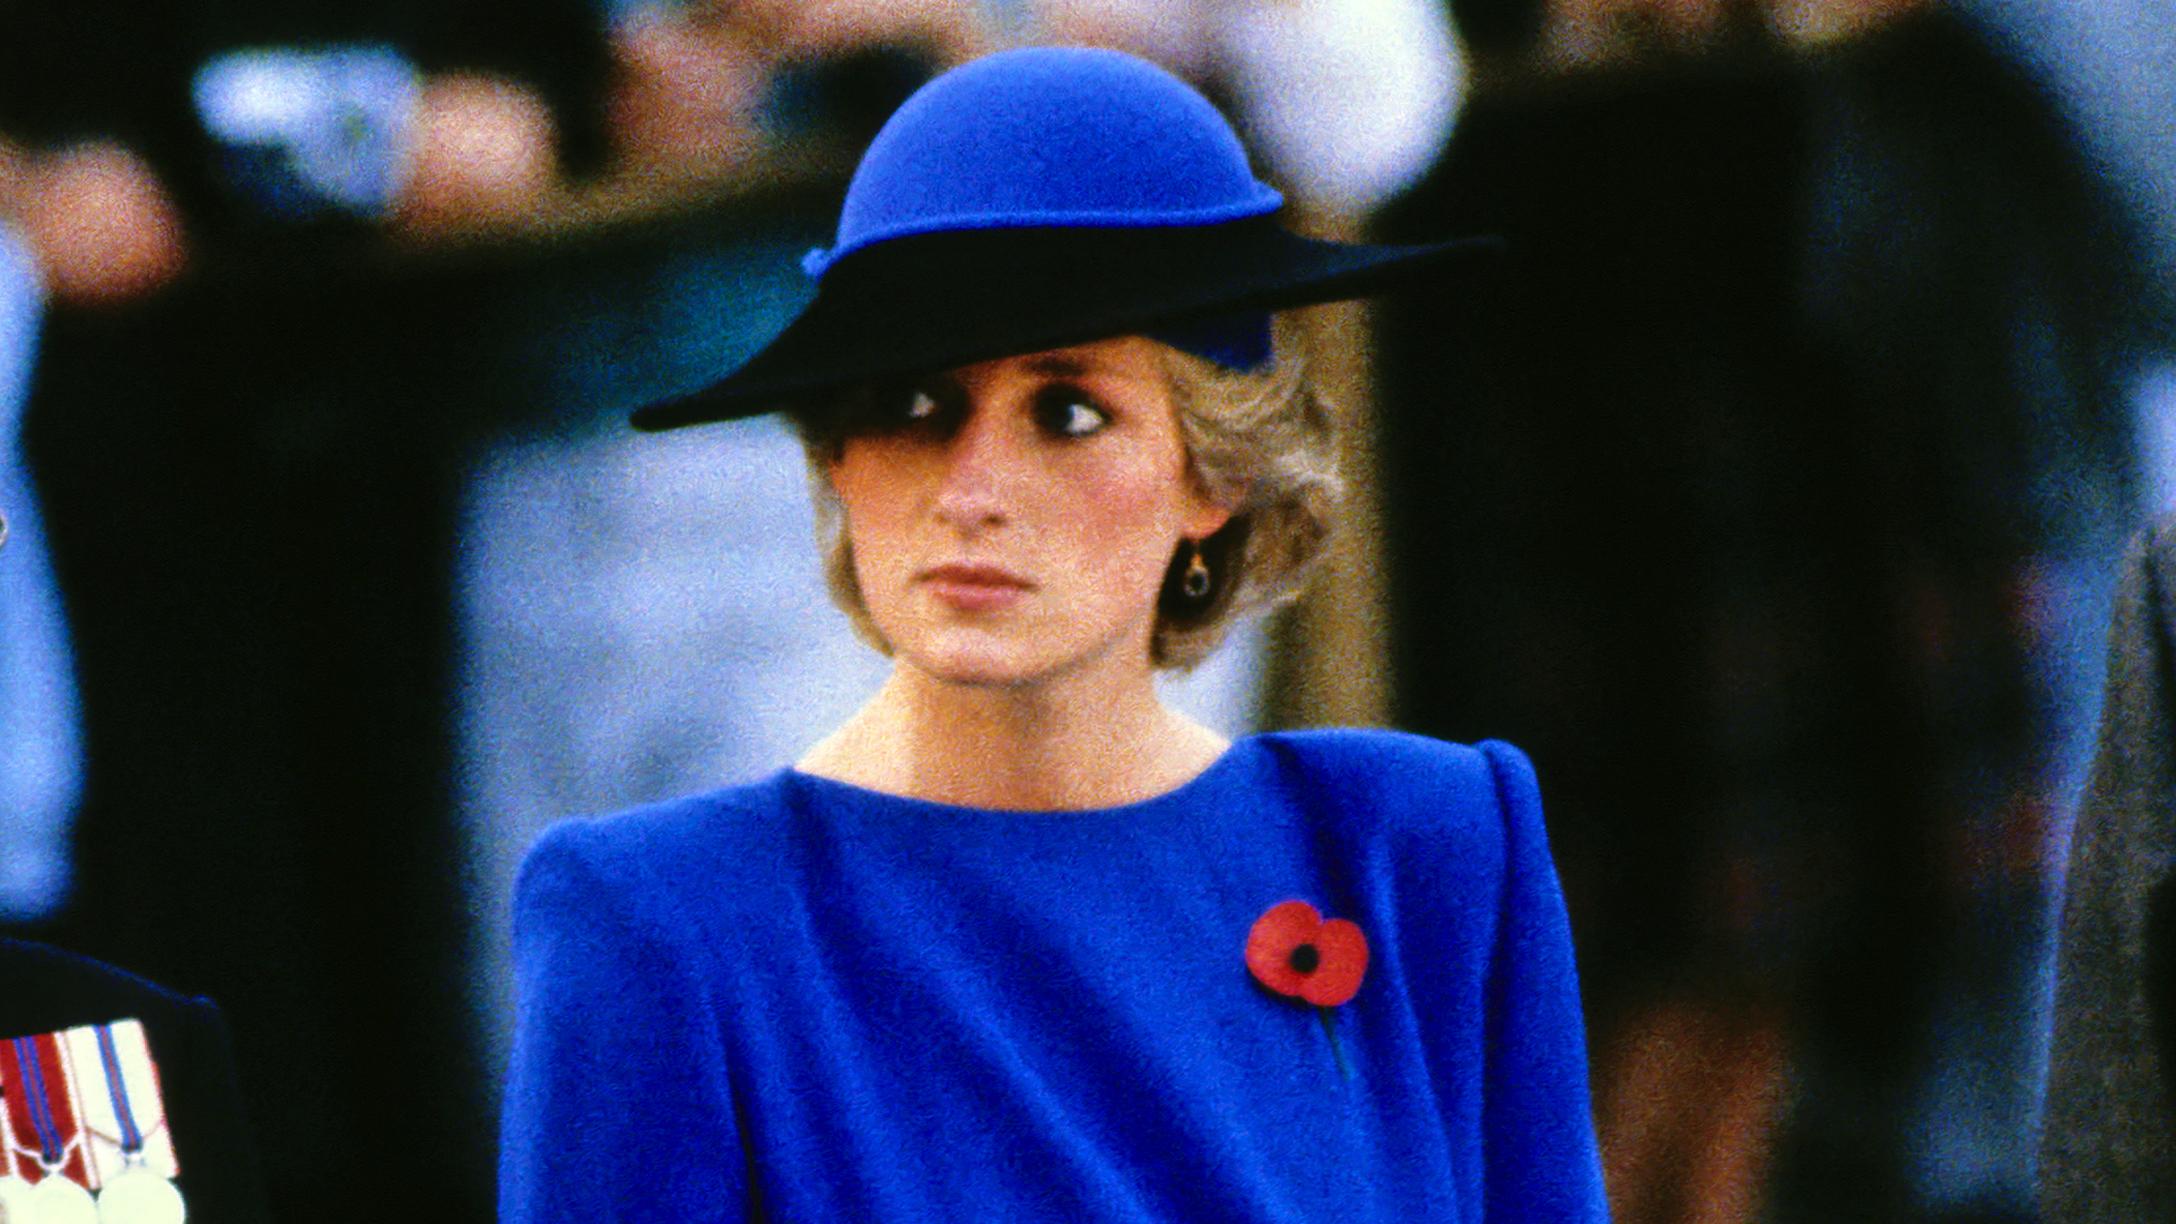 Emergency Responder Reveals New Details About Princess Diana's Death & Final Words